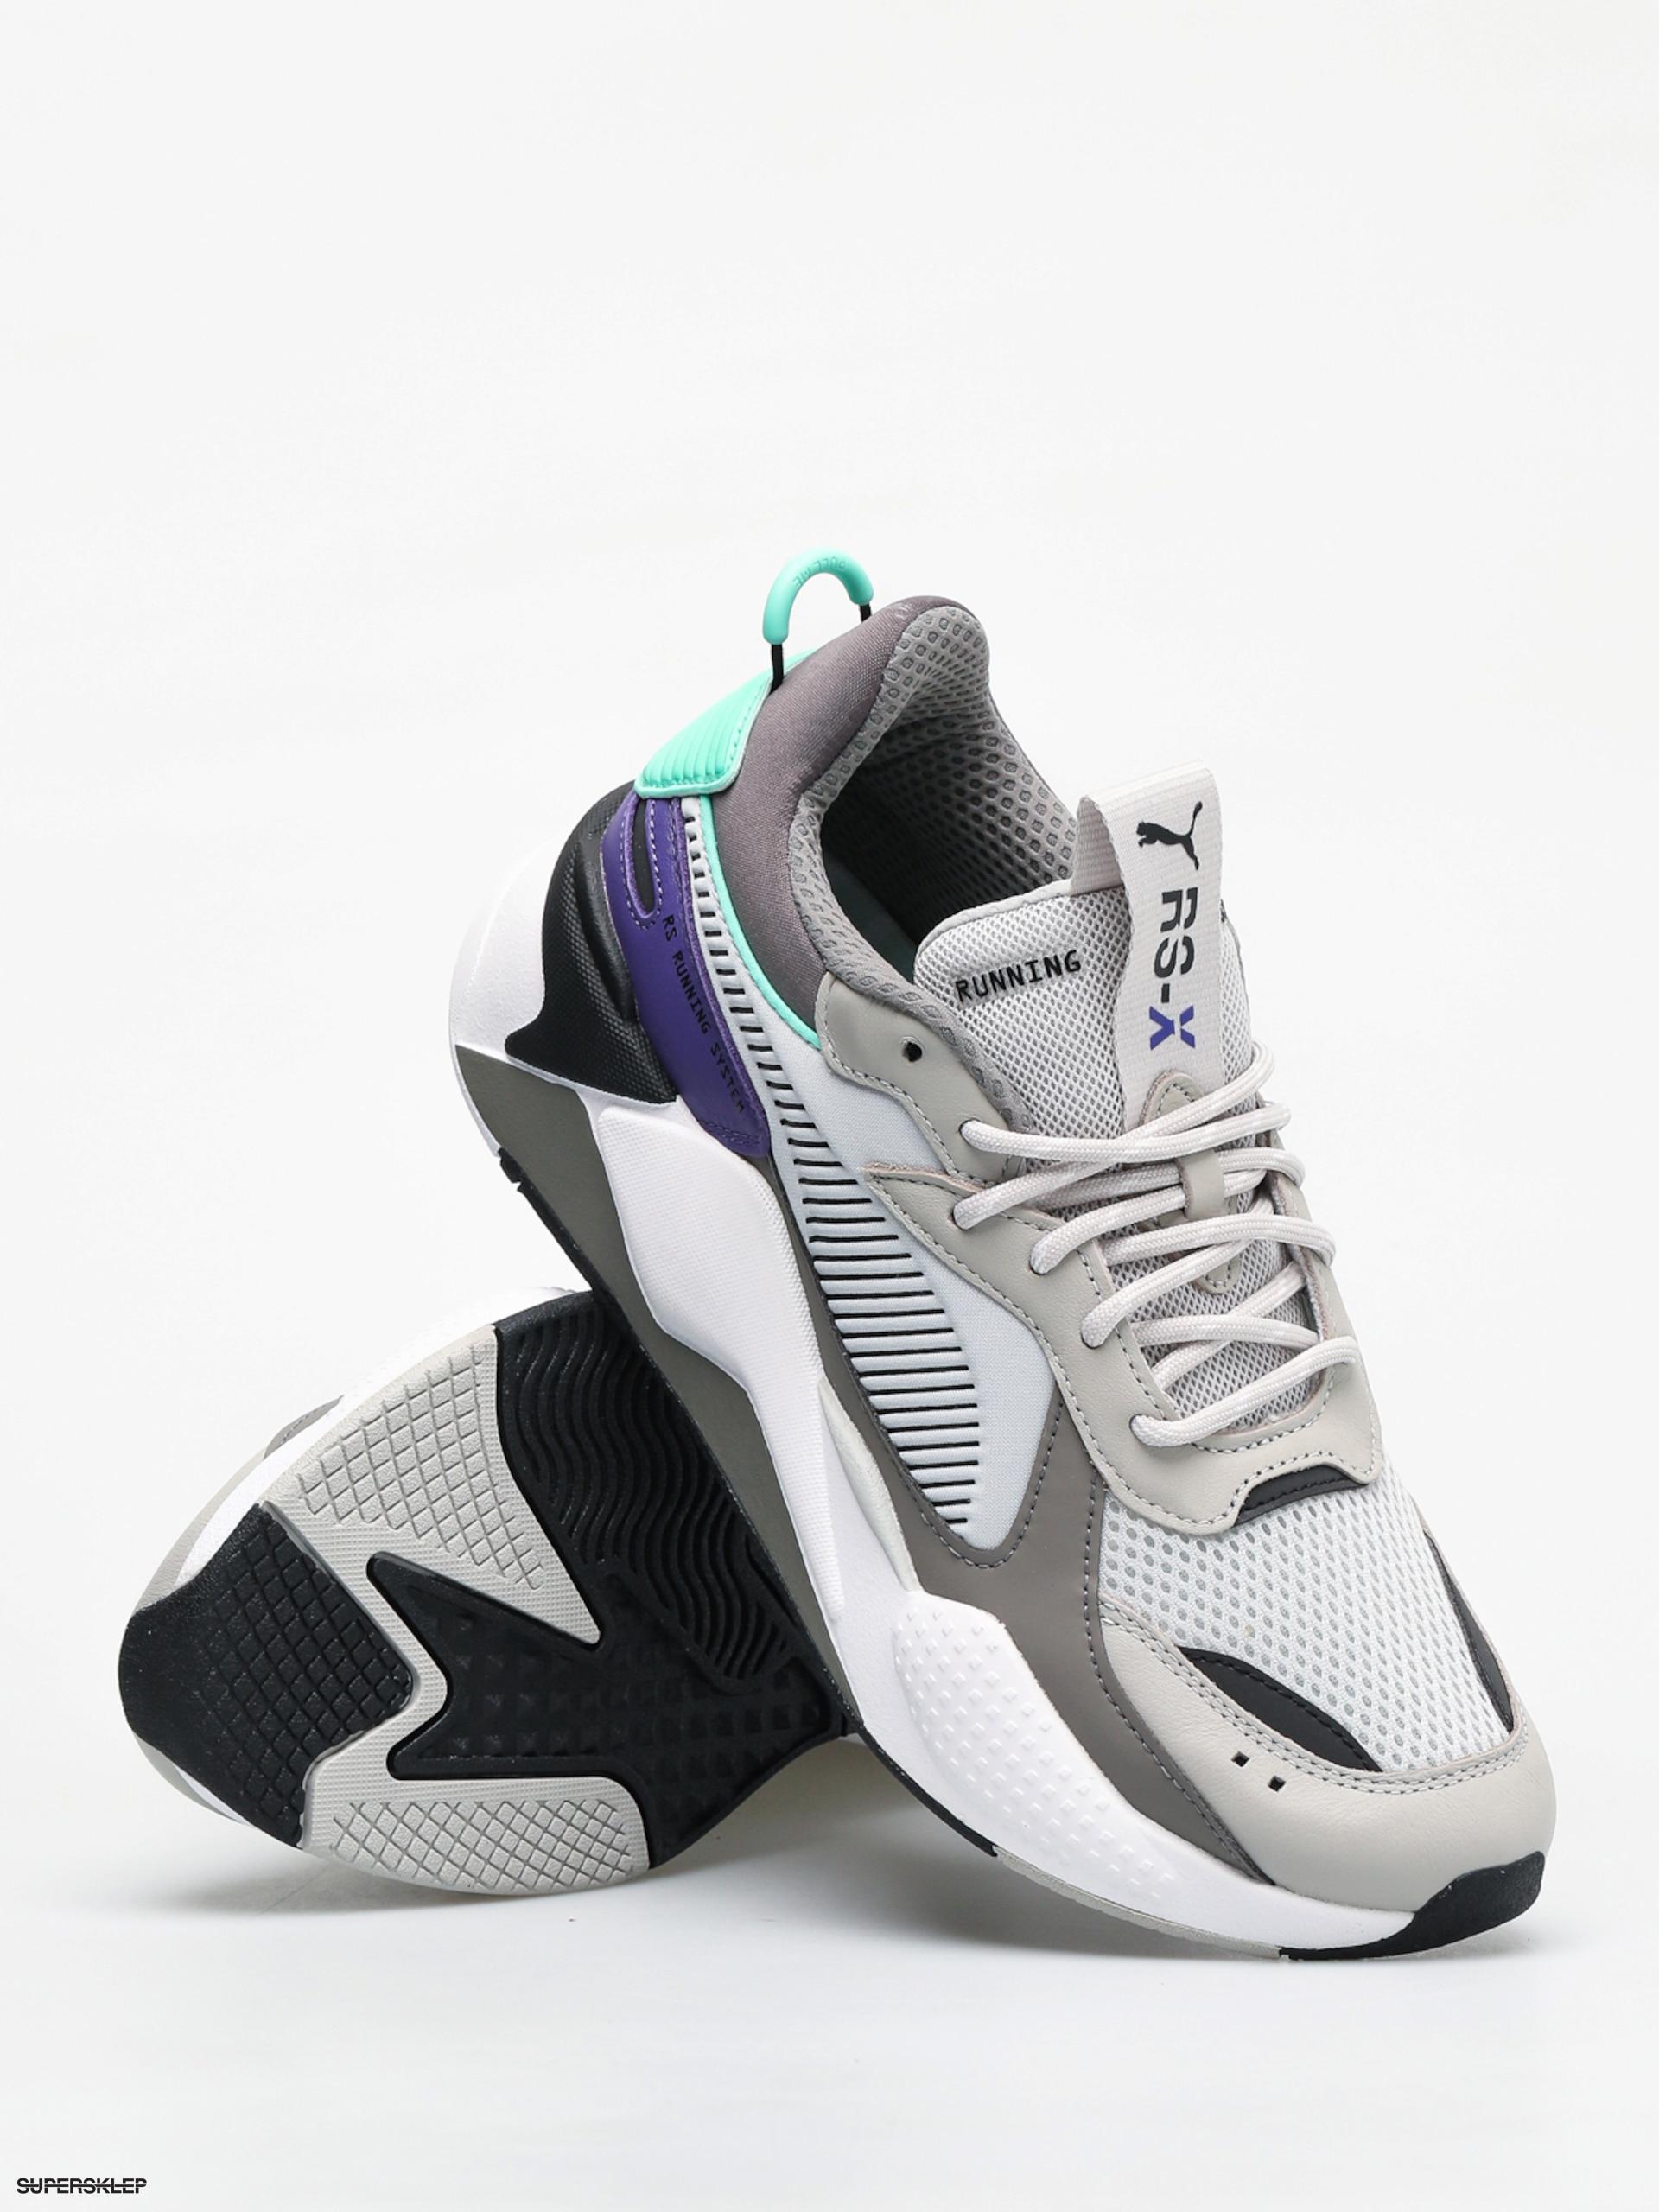 Buty Puma Rs X Tracks (gray violetcharcoal gray)